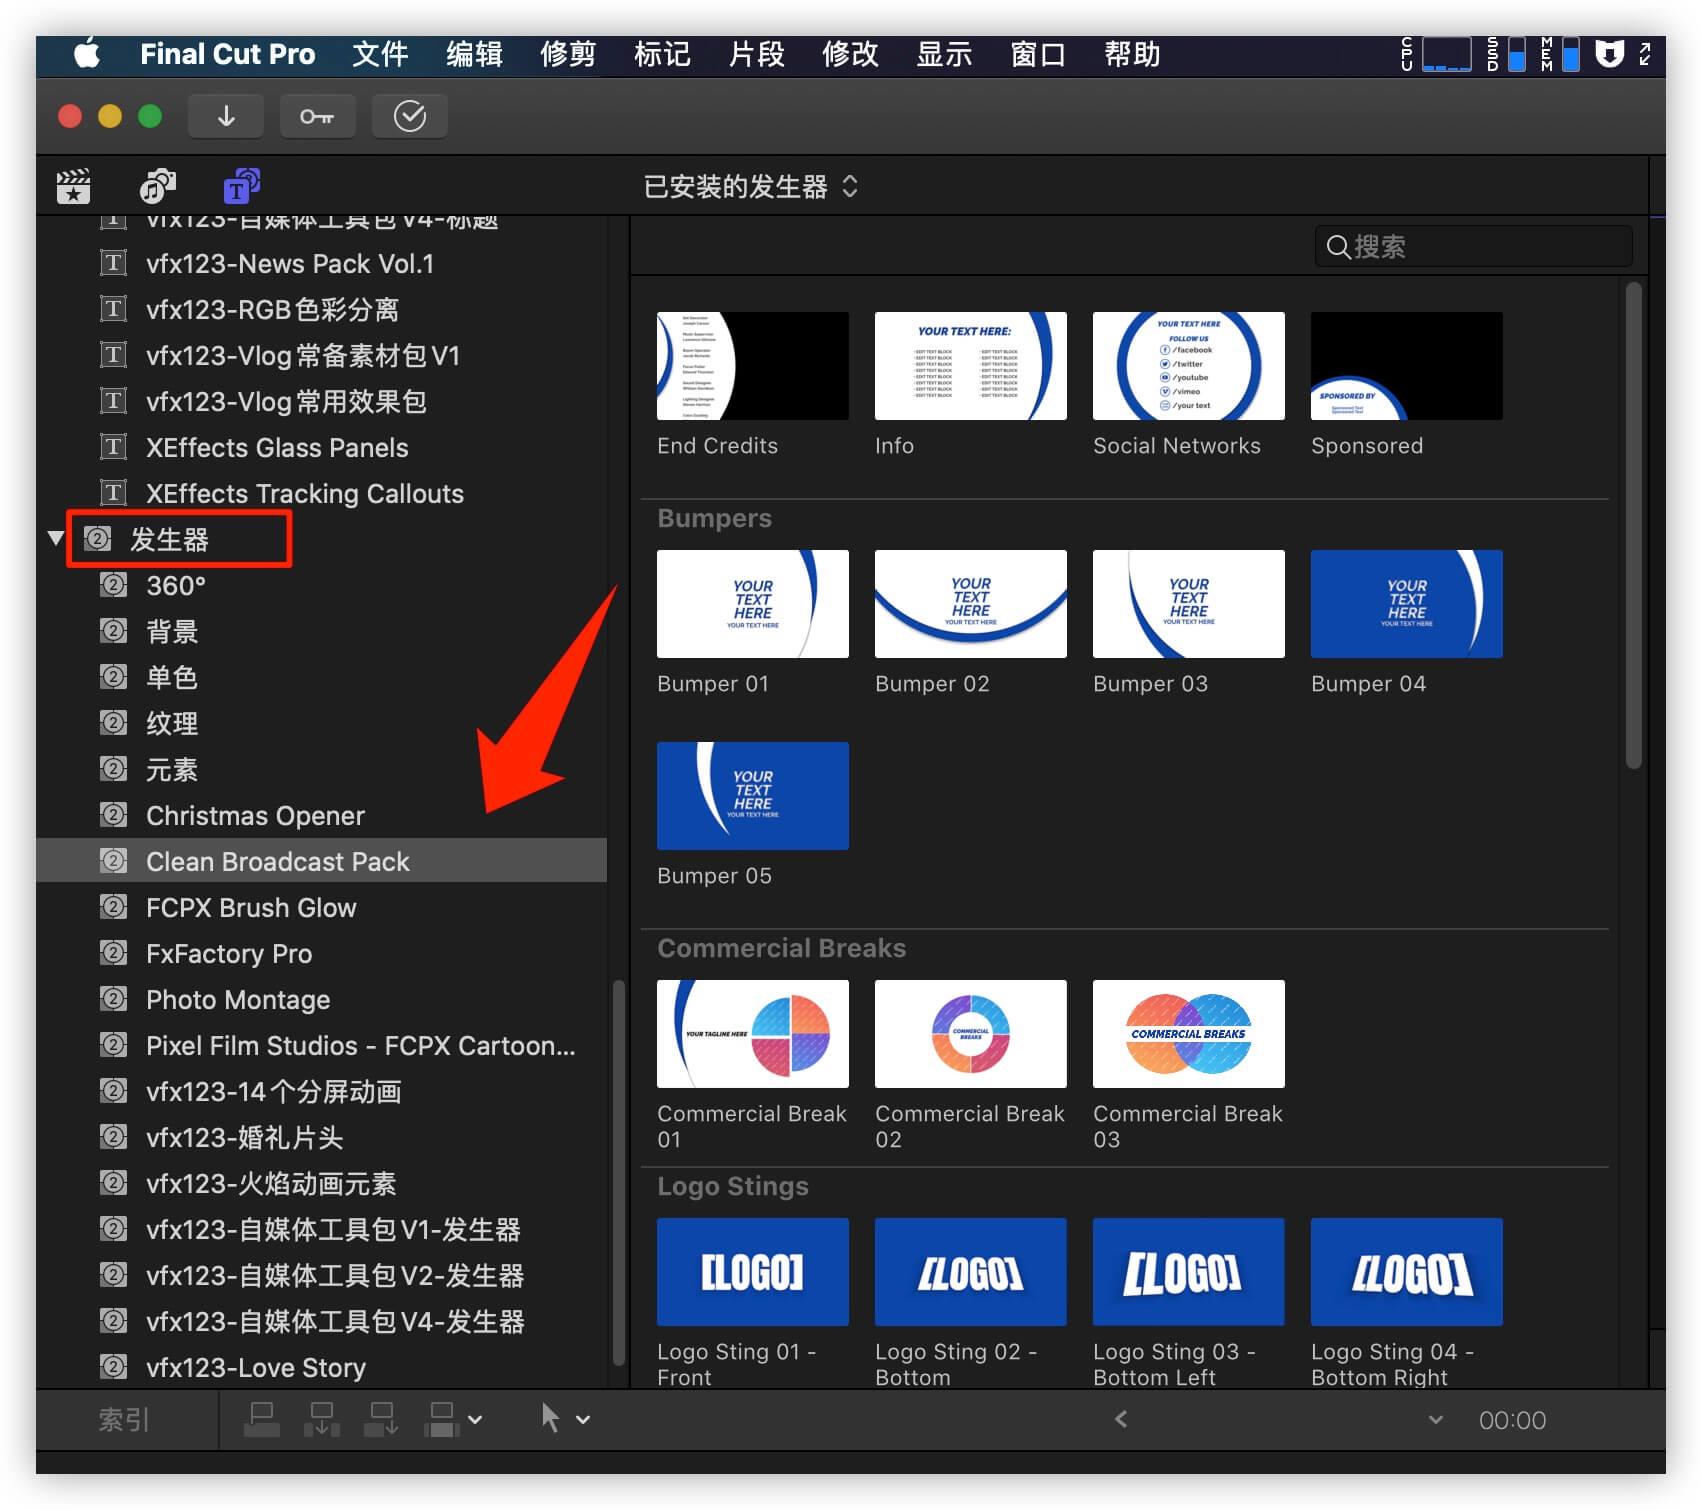 fcpx插件 简洁干净广播栏目包装模板包 Clean Broadcast Pack